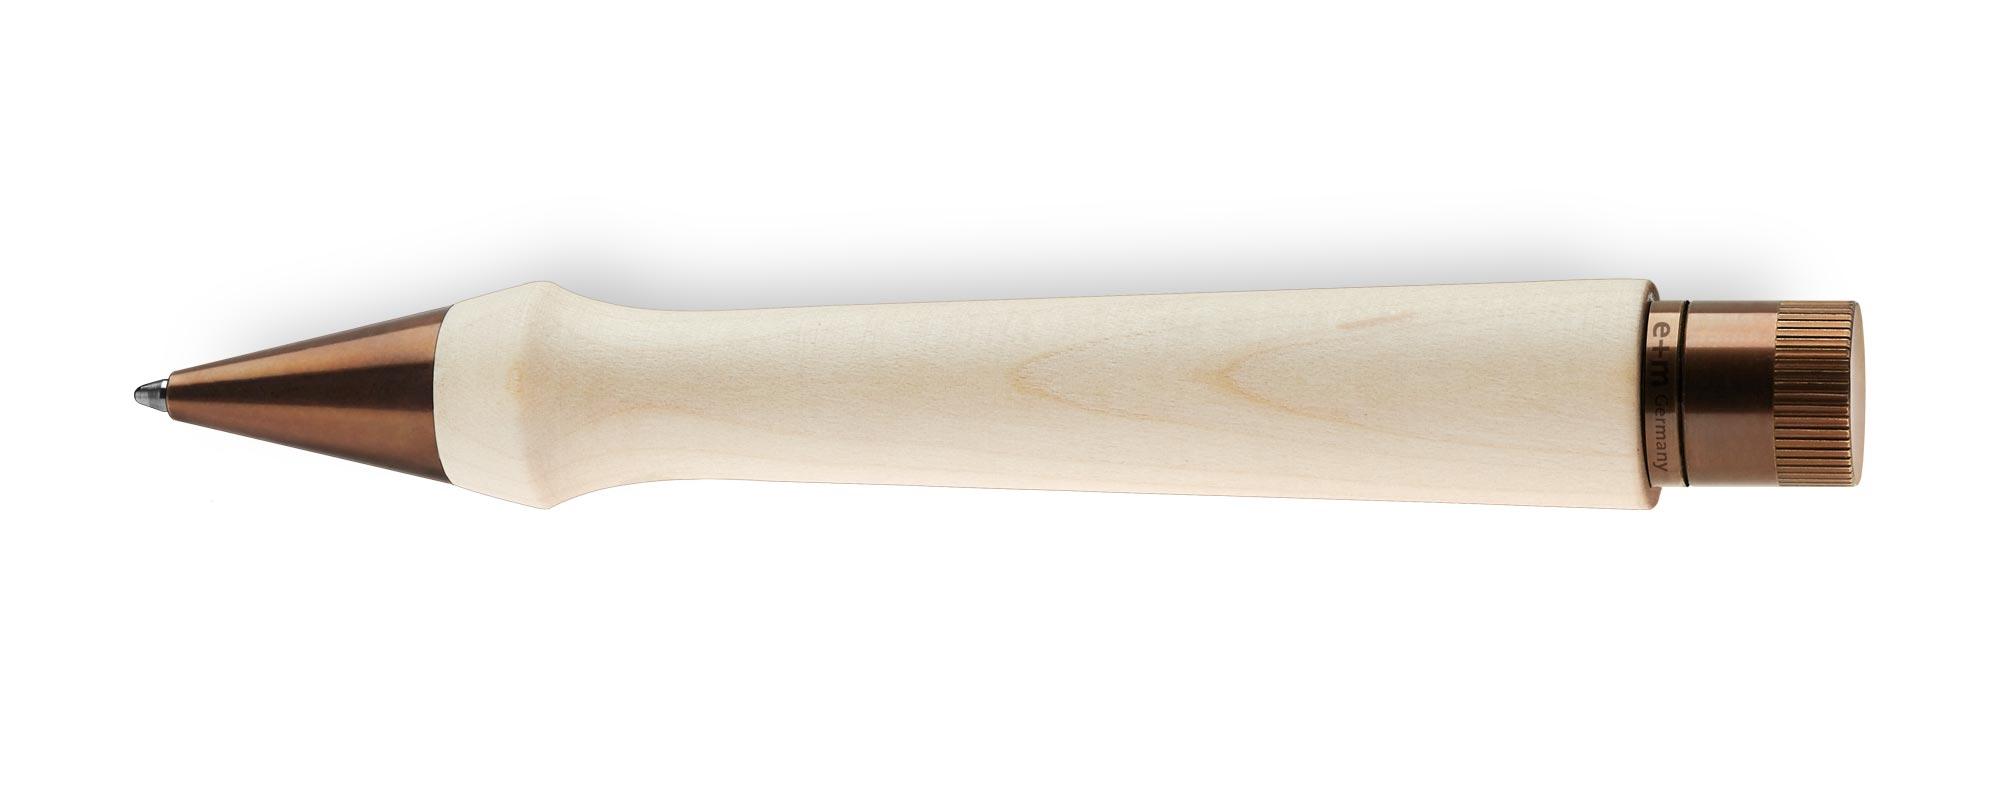 arrow_high_quality_wood_pens_2